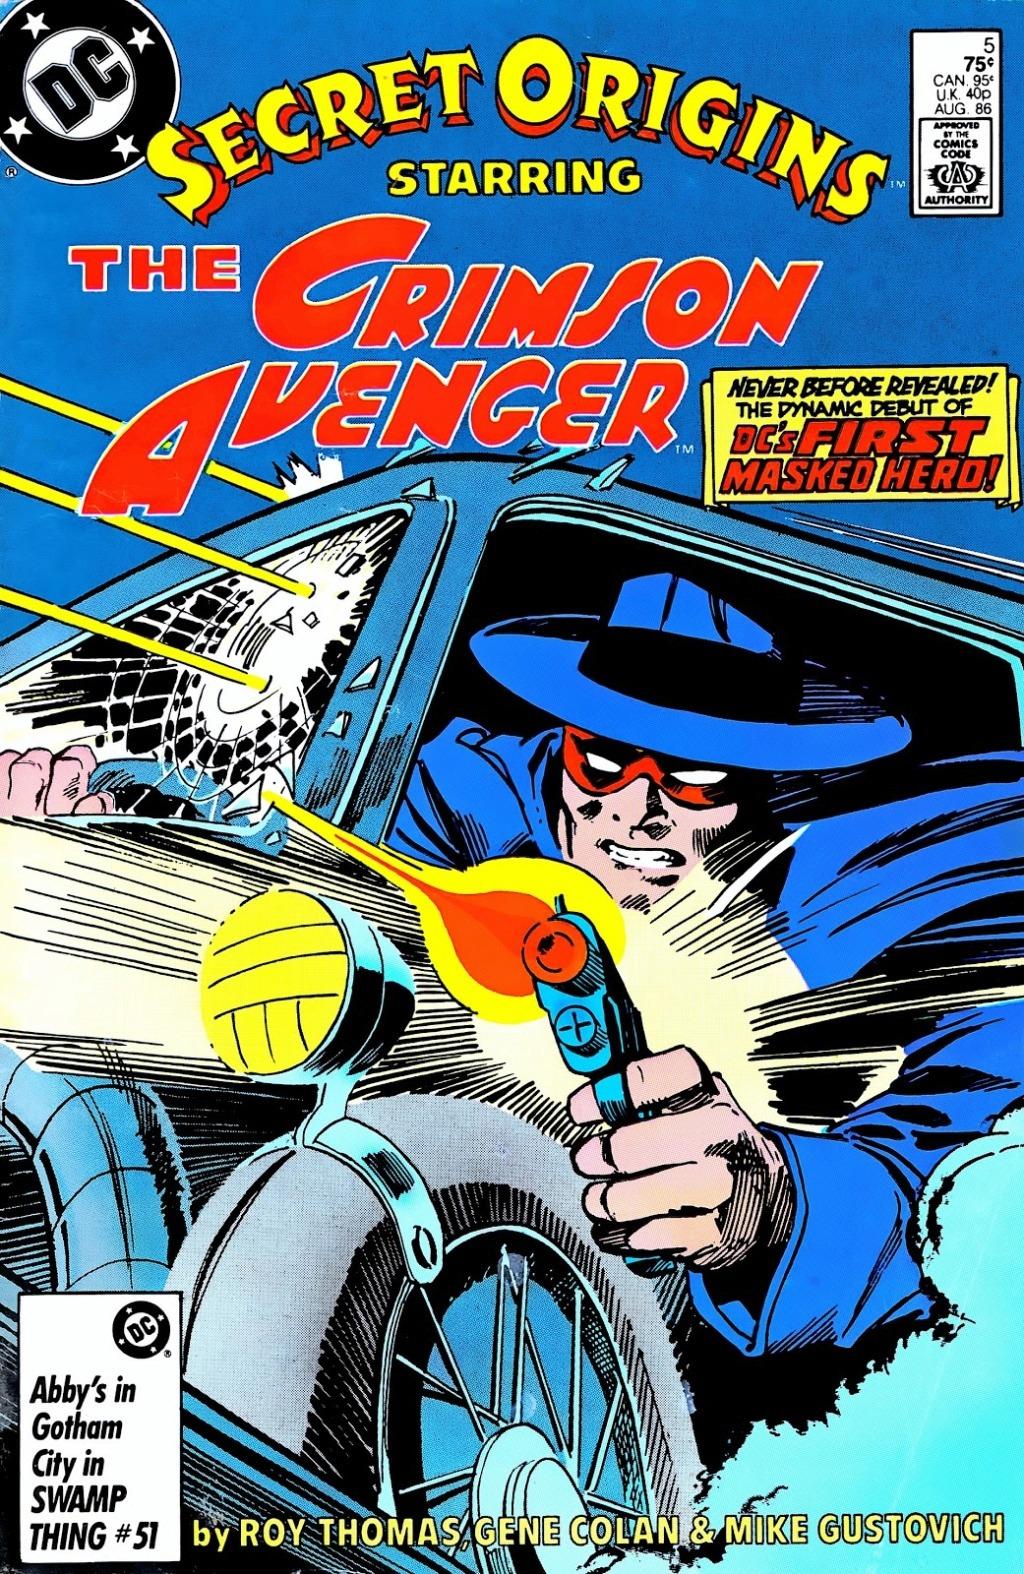 DC's first superhero: Golden Age Crimson Avenger (Lee Travis